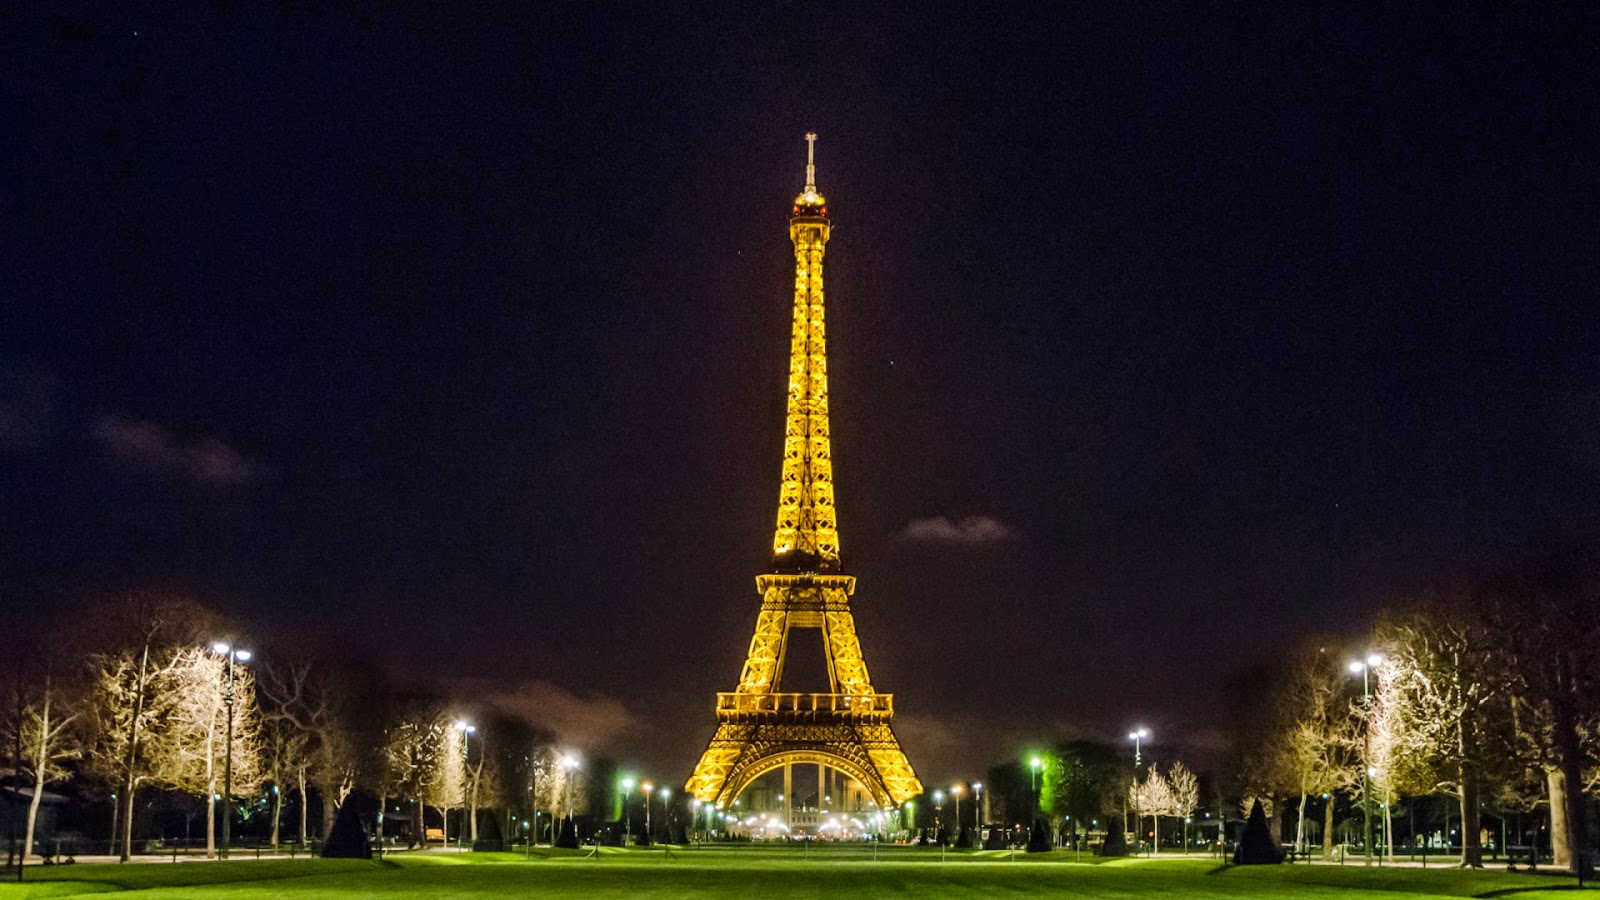 Hd wallpaper eiffel tower - Eiffel Tower Night Desktop Backgrounds Eiffel Tower Night Wallpapers